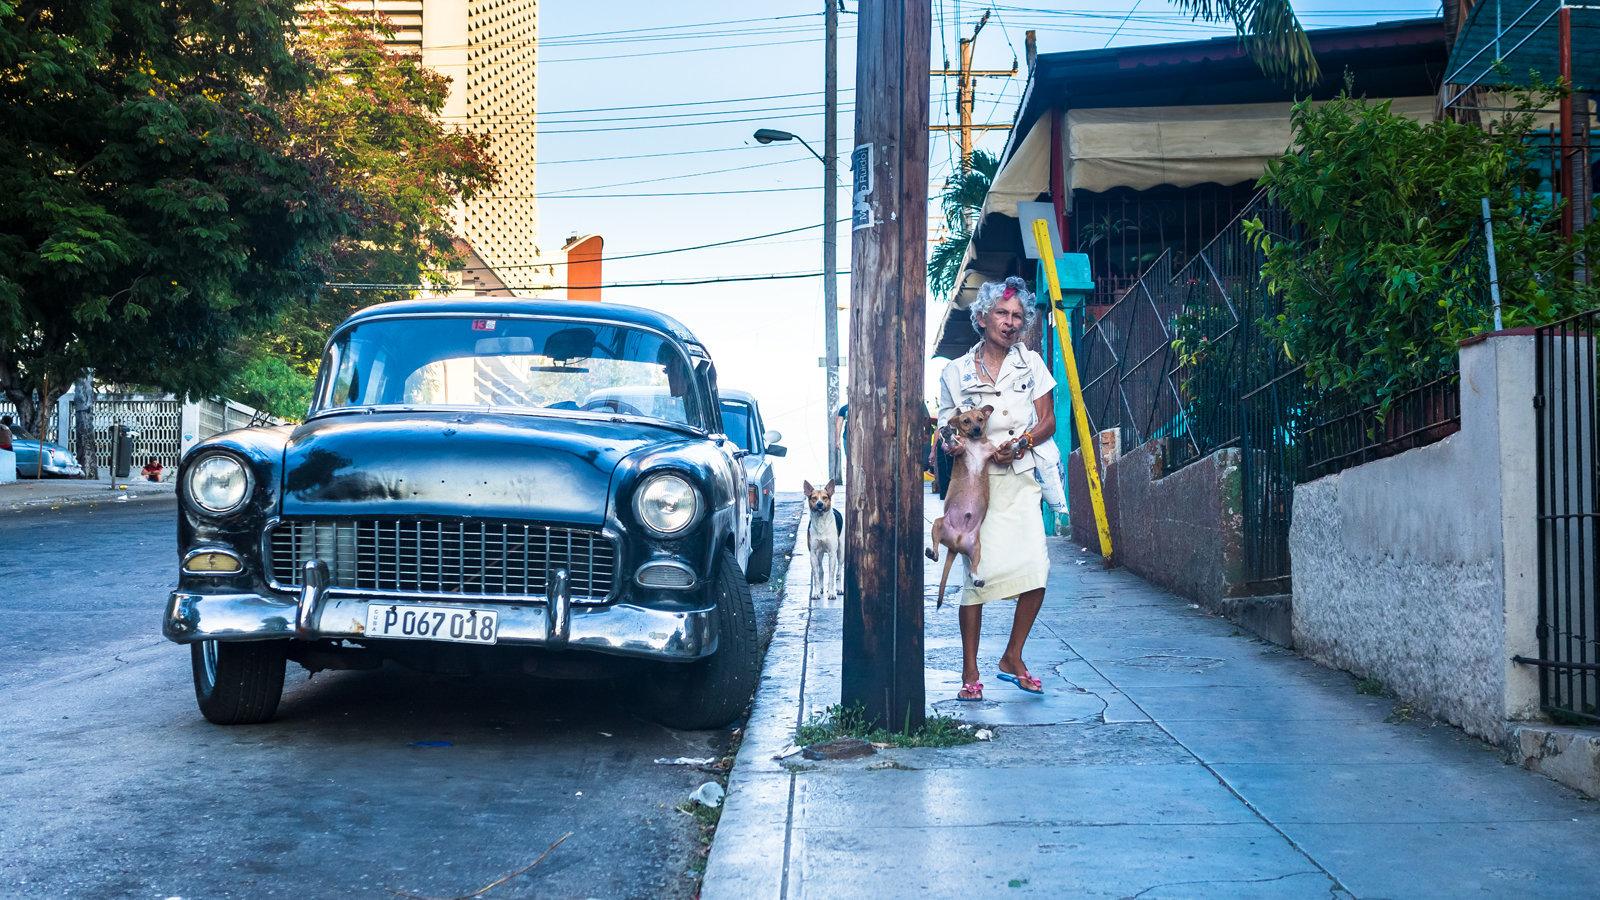 06_Cuba_2014_Erik_Hart_Lensculture_1600px.jpg